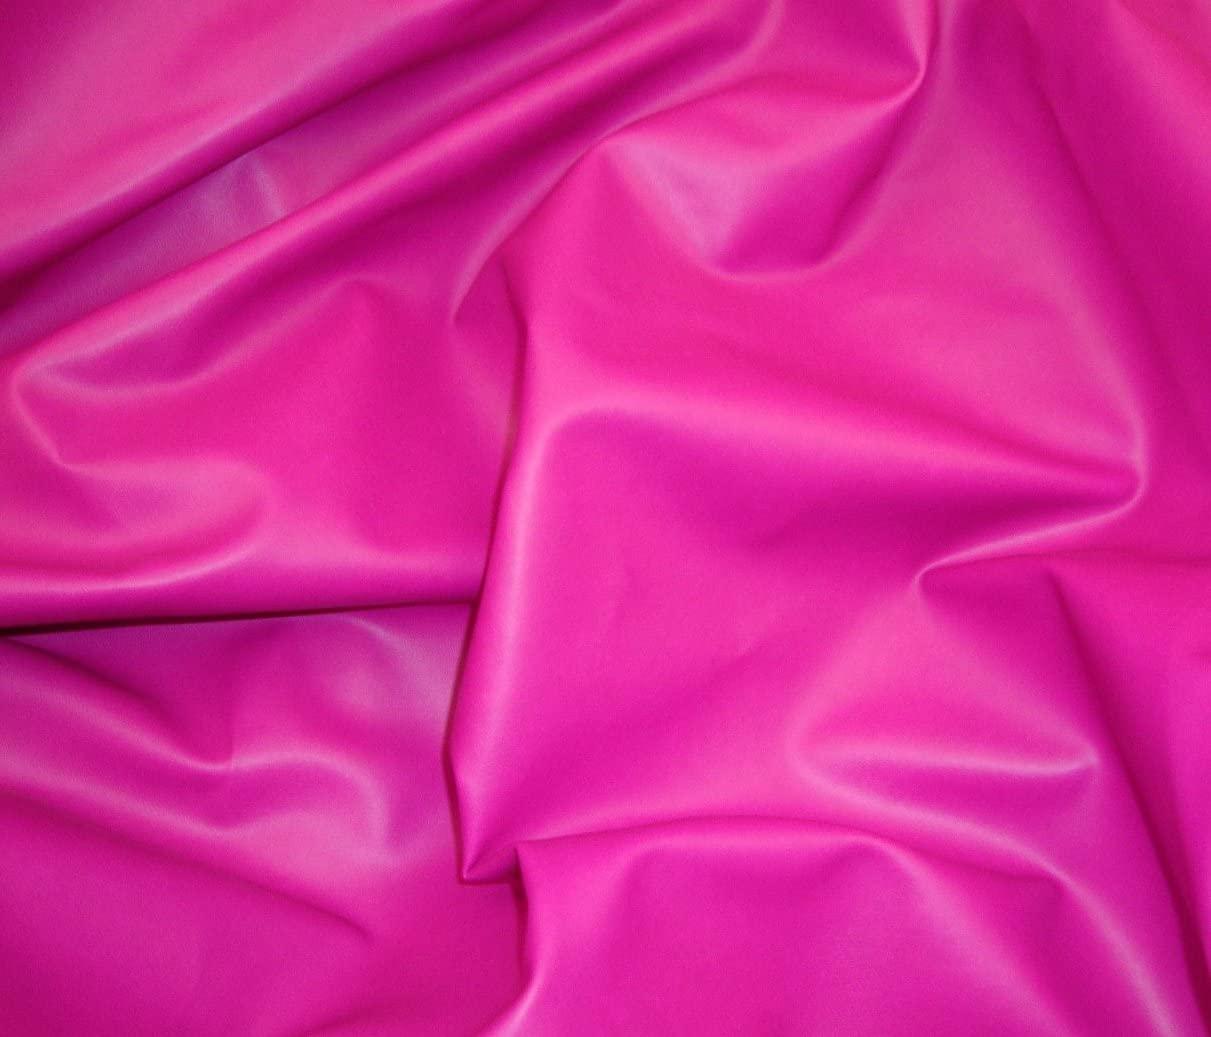 luvfabrics Vinyl Faux Leather Fuchsia Soft Skin Upholstery Fabric 55